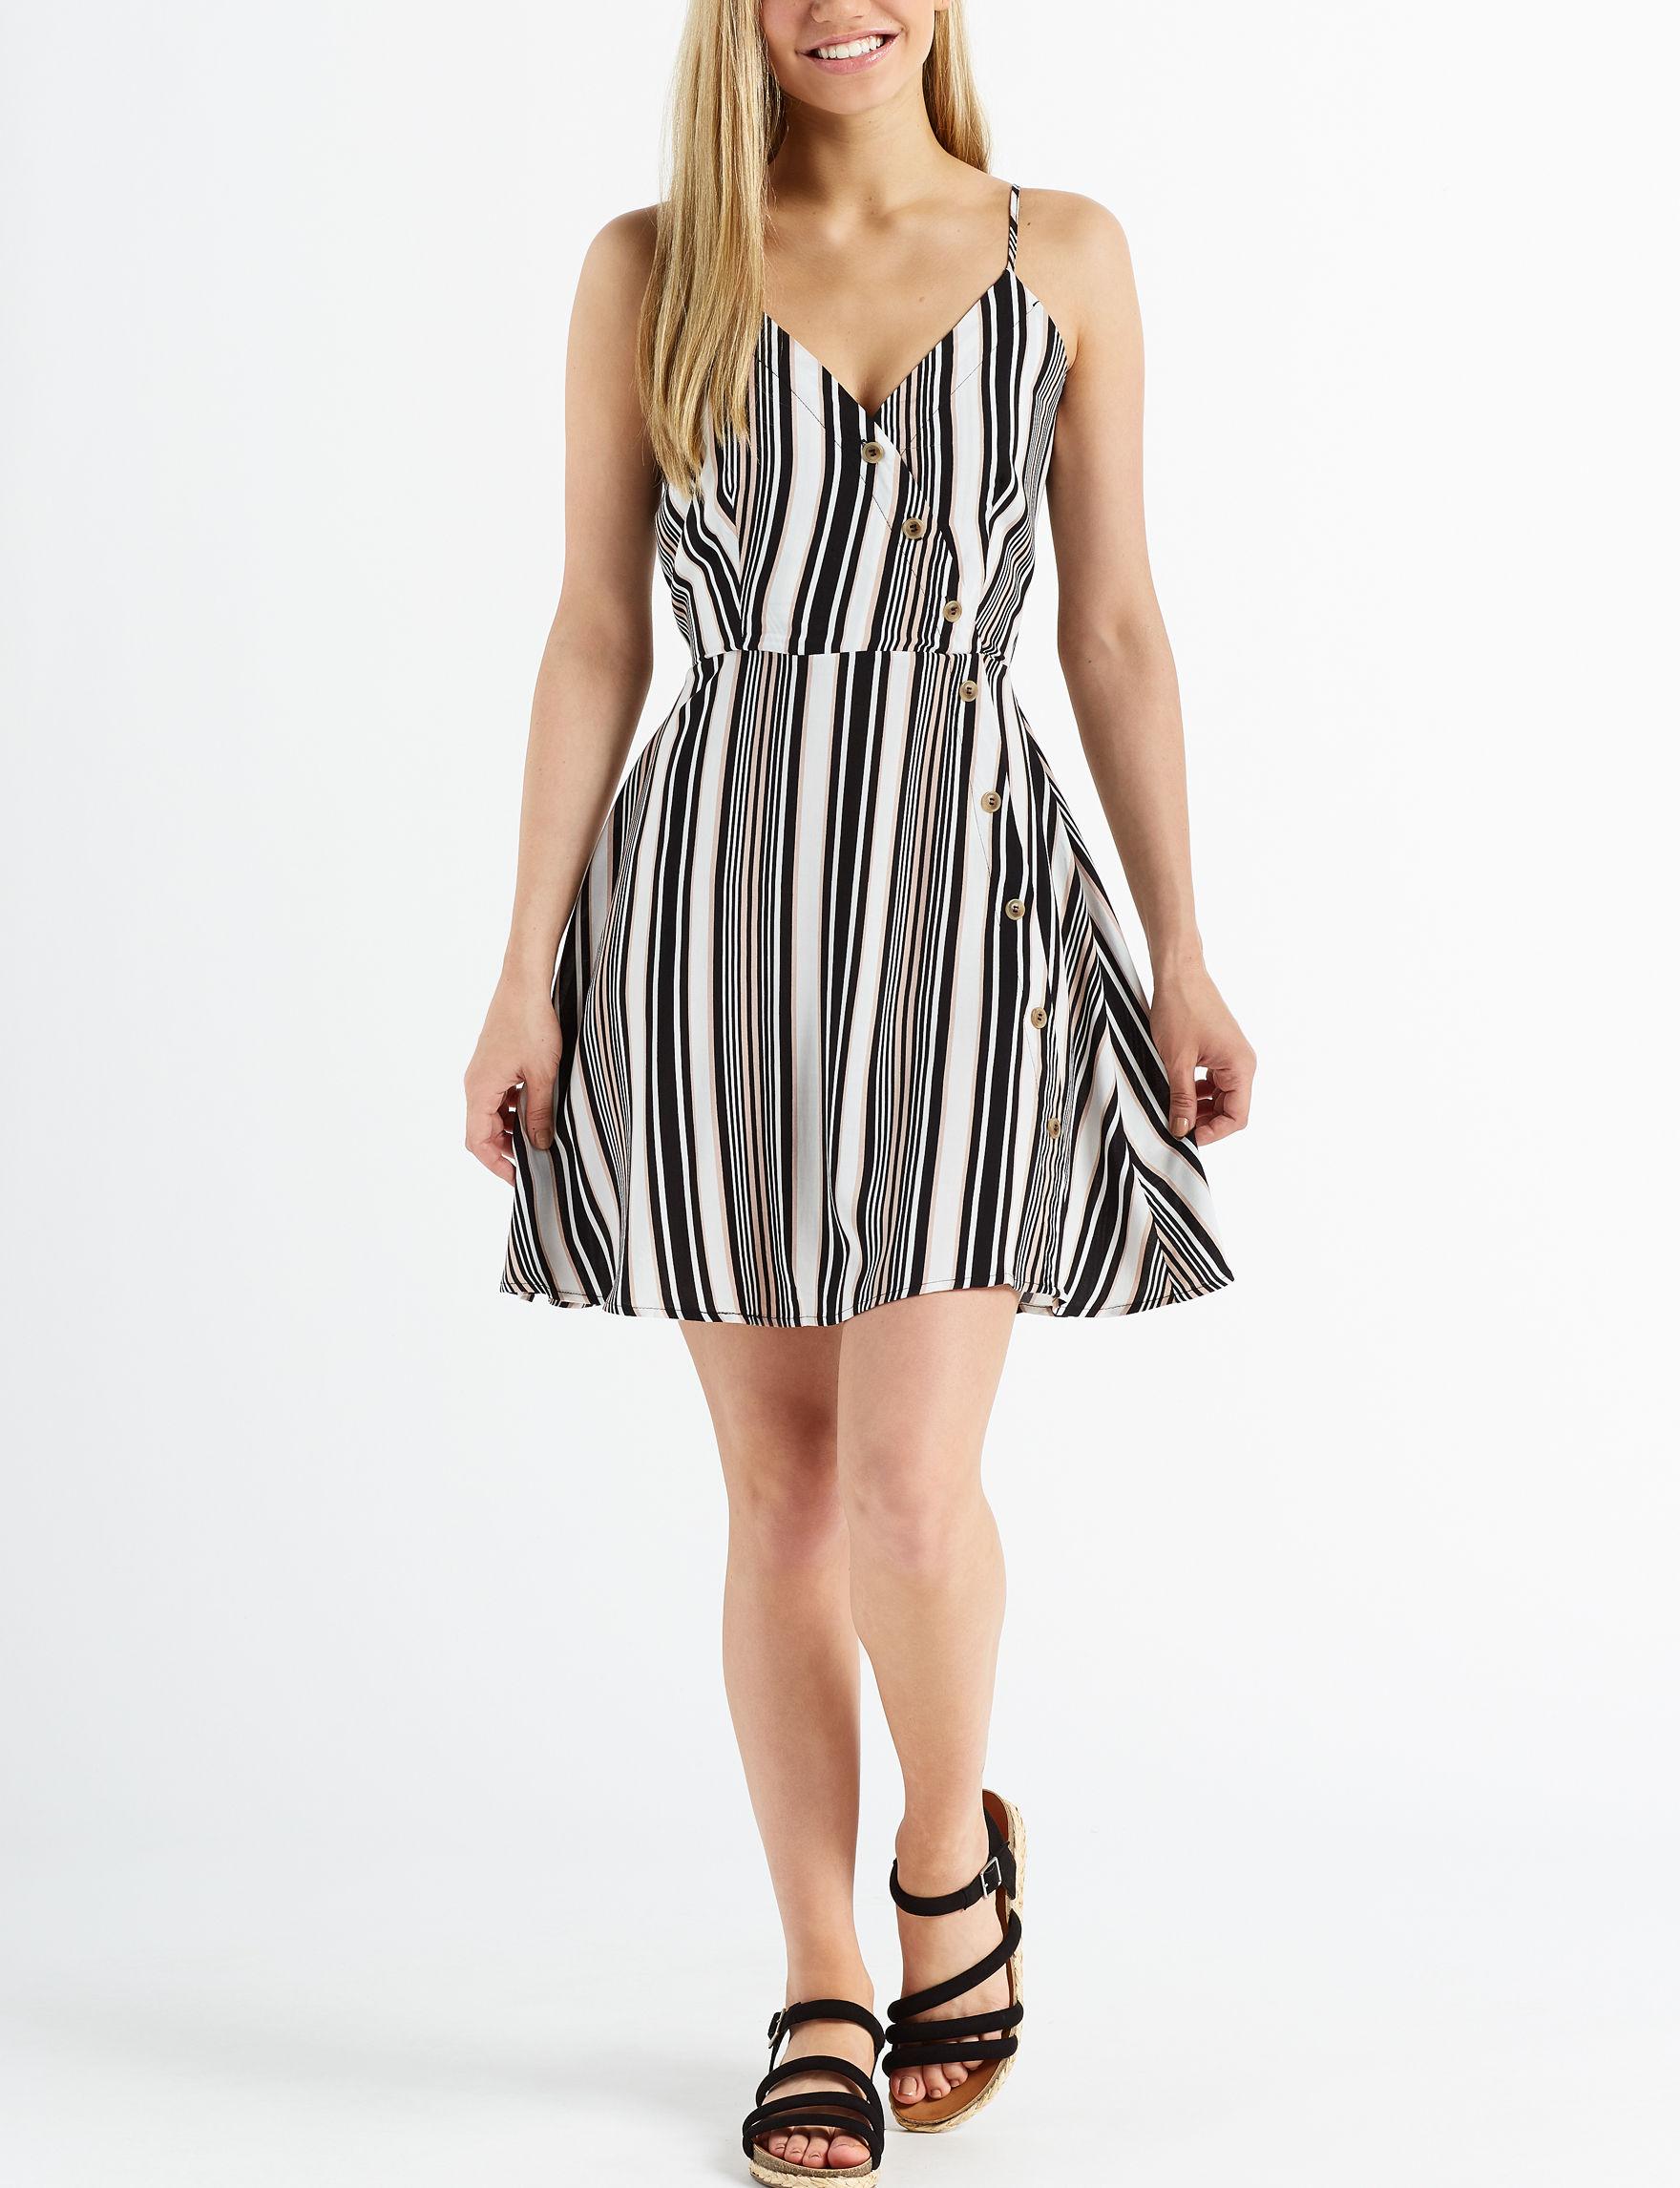 Wishful Park Black Stripe Fit & Flare Dresses